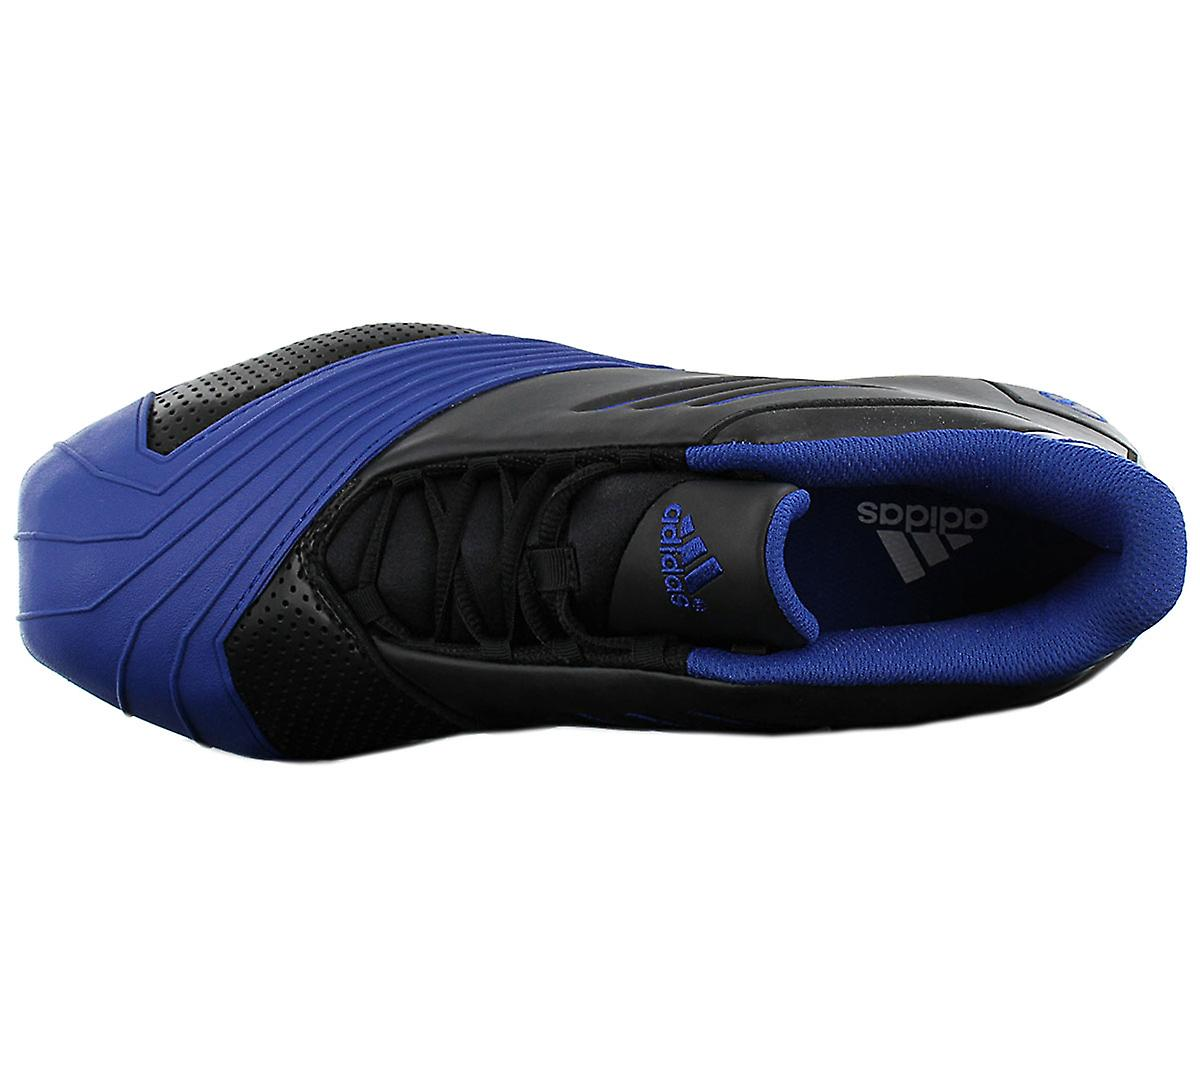 adidas T-MAC 1 Retro Pack - Tracy McGrady - Herren Basketballschuhe Schwarz EE6843 Sneakers Sportschuhe qOGH39